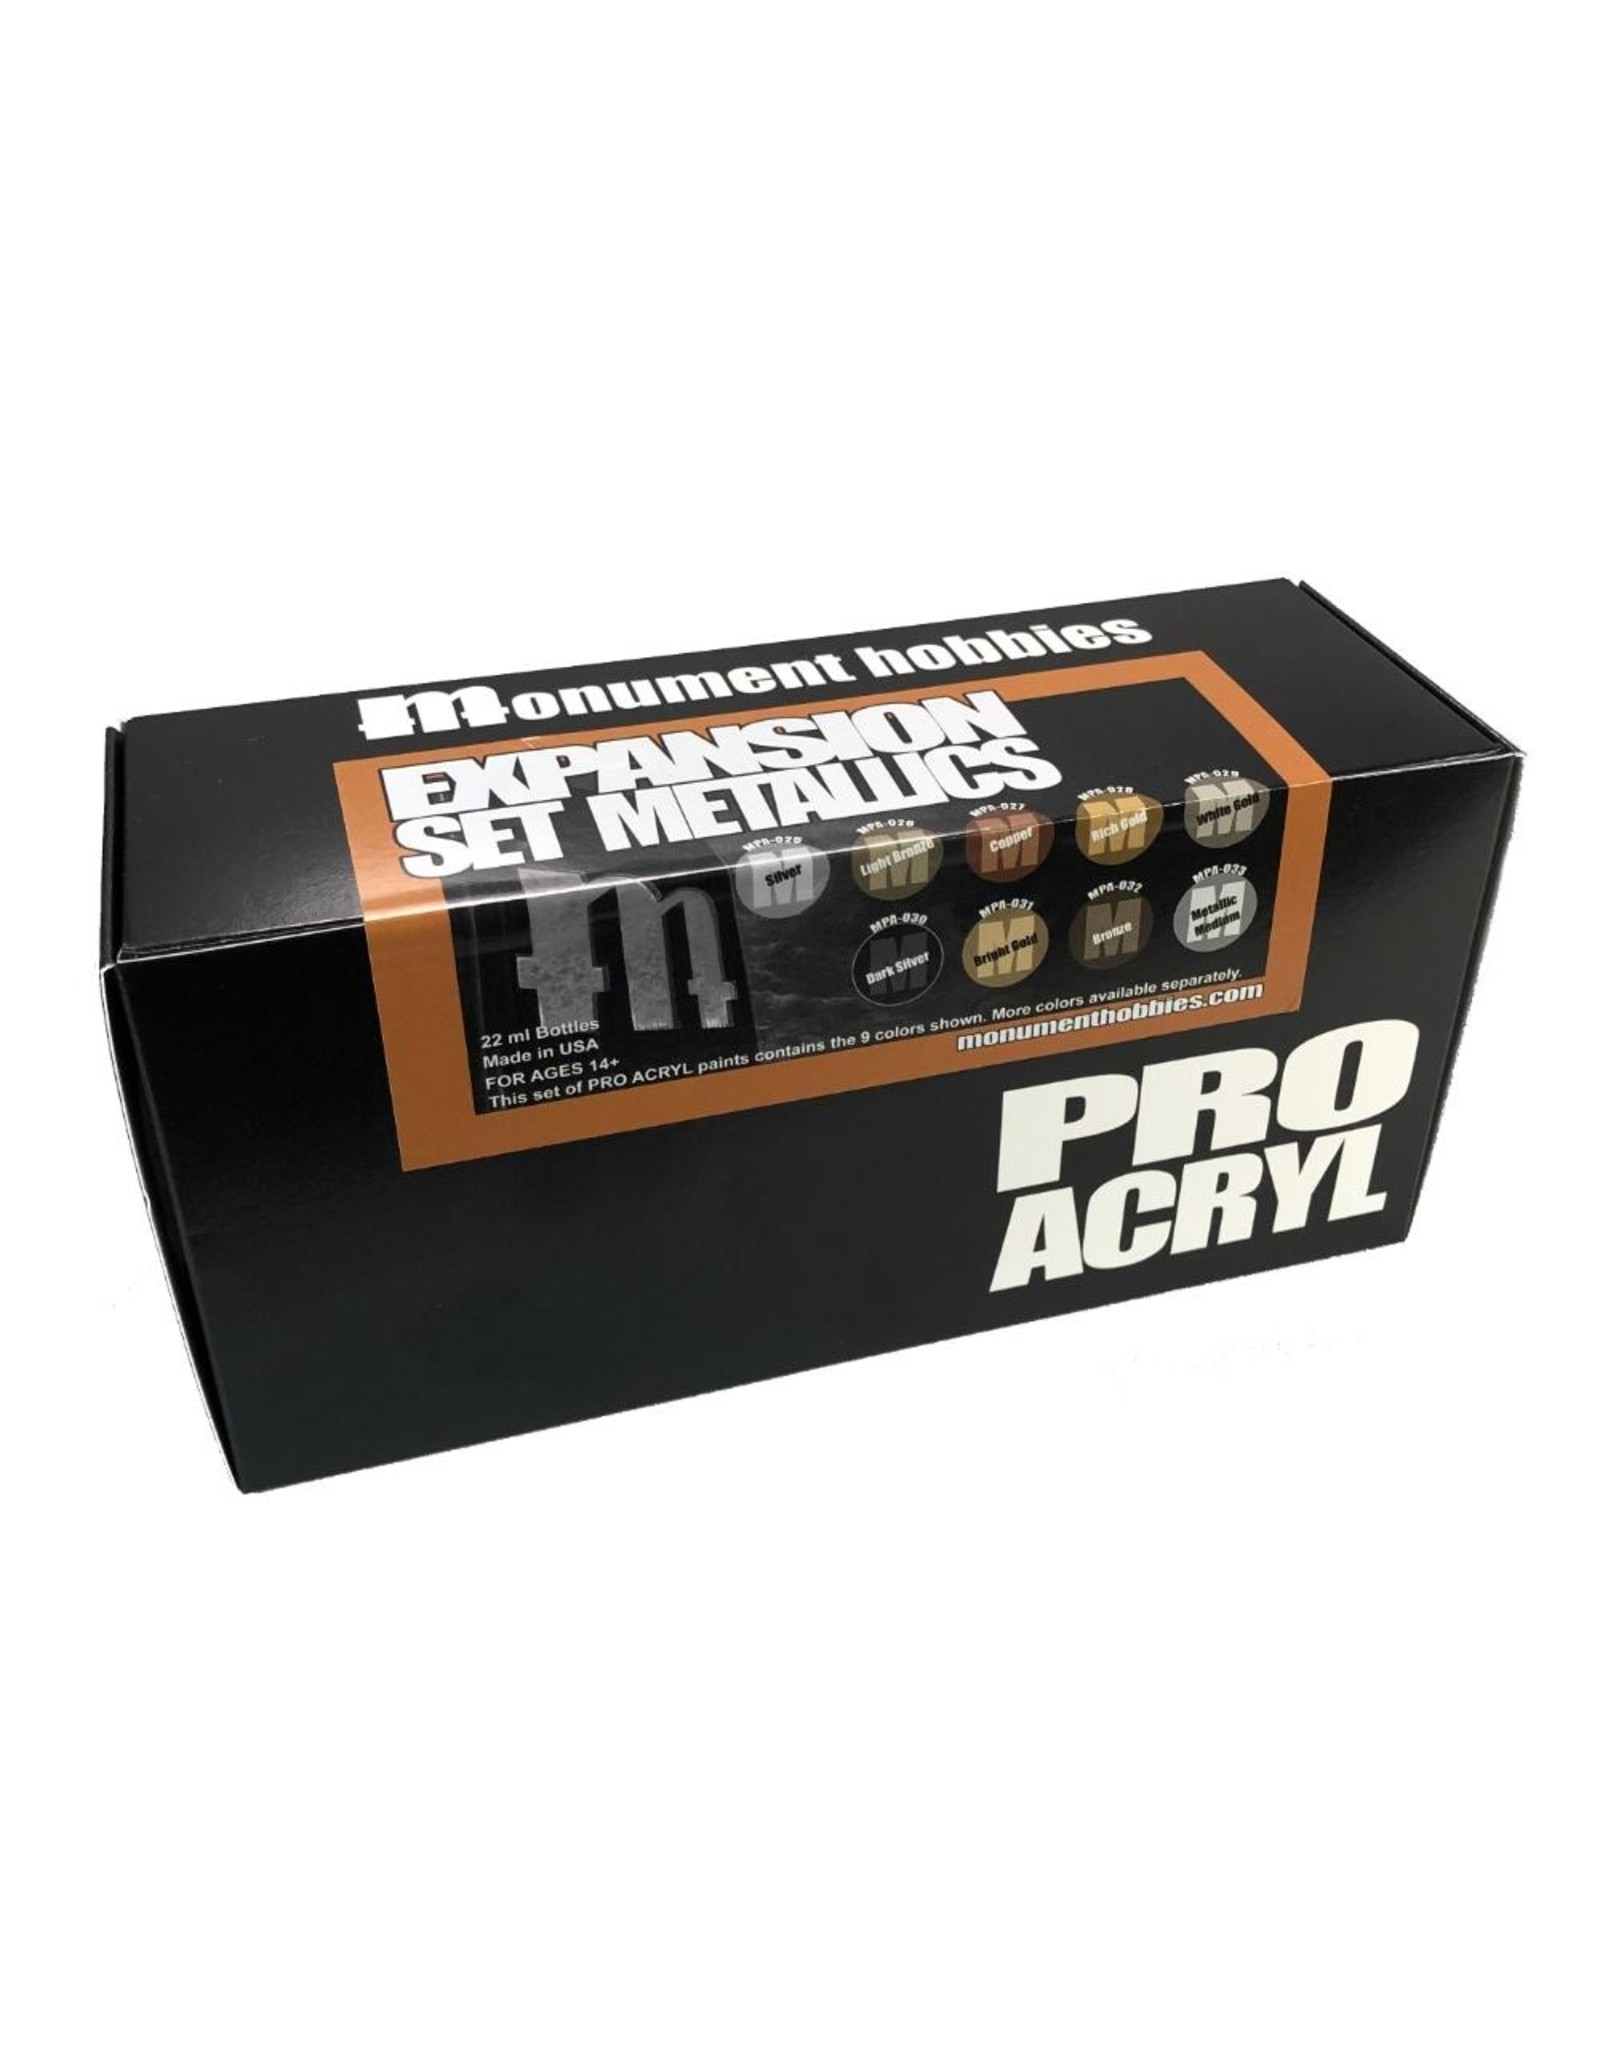 Pro Acryl Pro Acryl Metallic Set